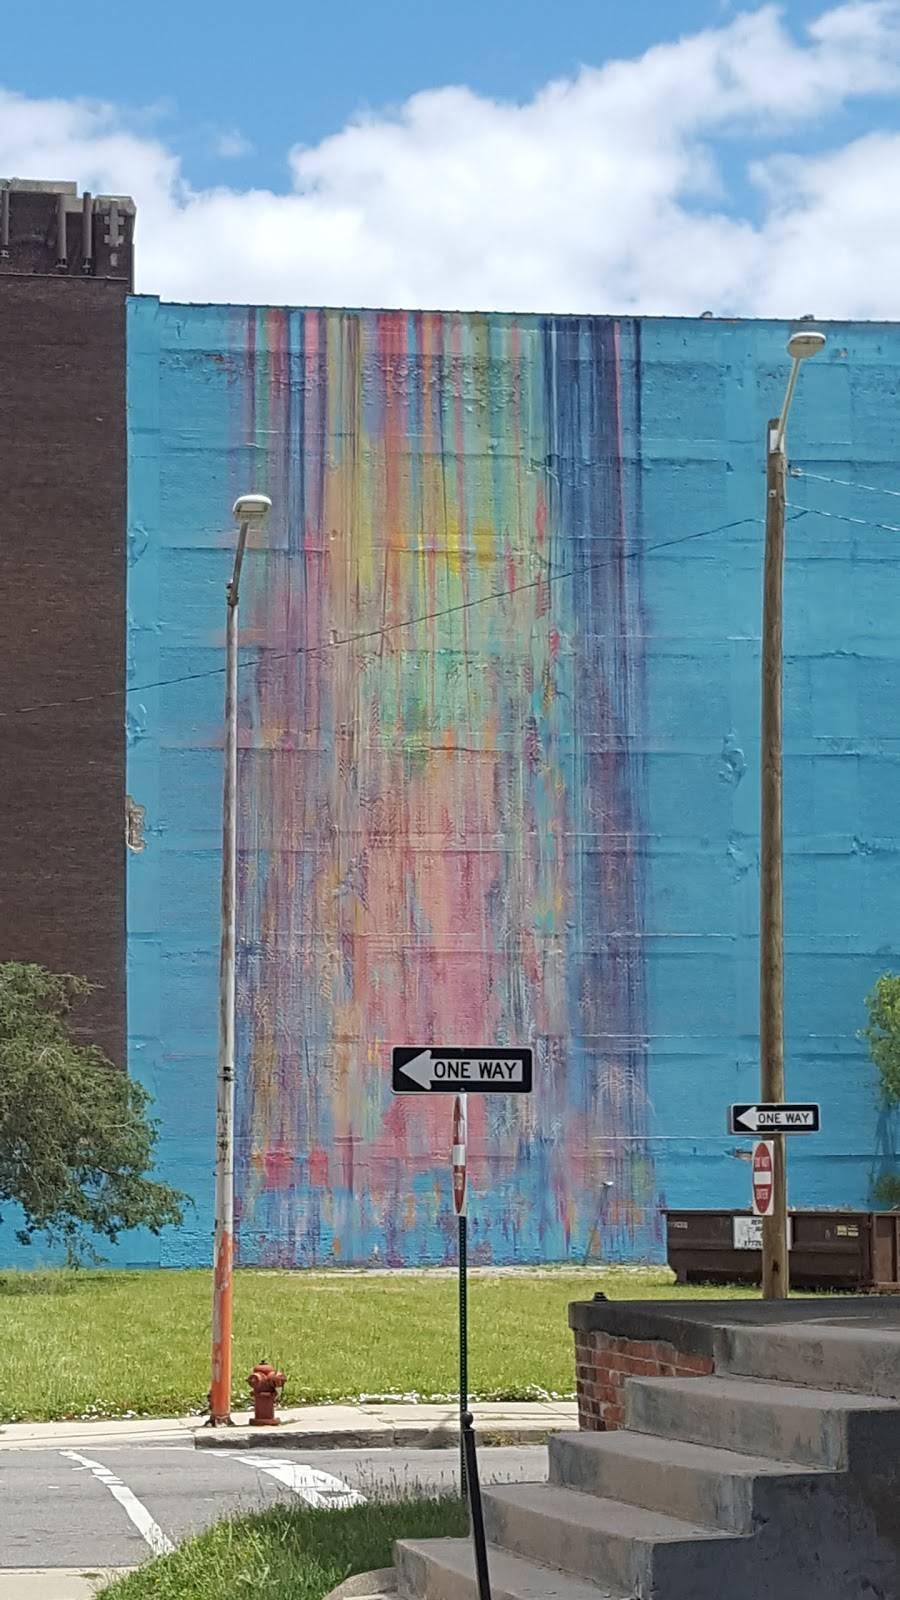 The Illuminated Mural - museum  | Photo 1 of 10 | Address: 2967 E Grand Blvd, Detroit, MI 48202, USA | Phone: (248) 885-4156